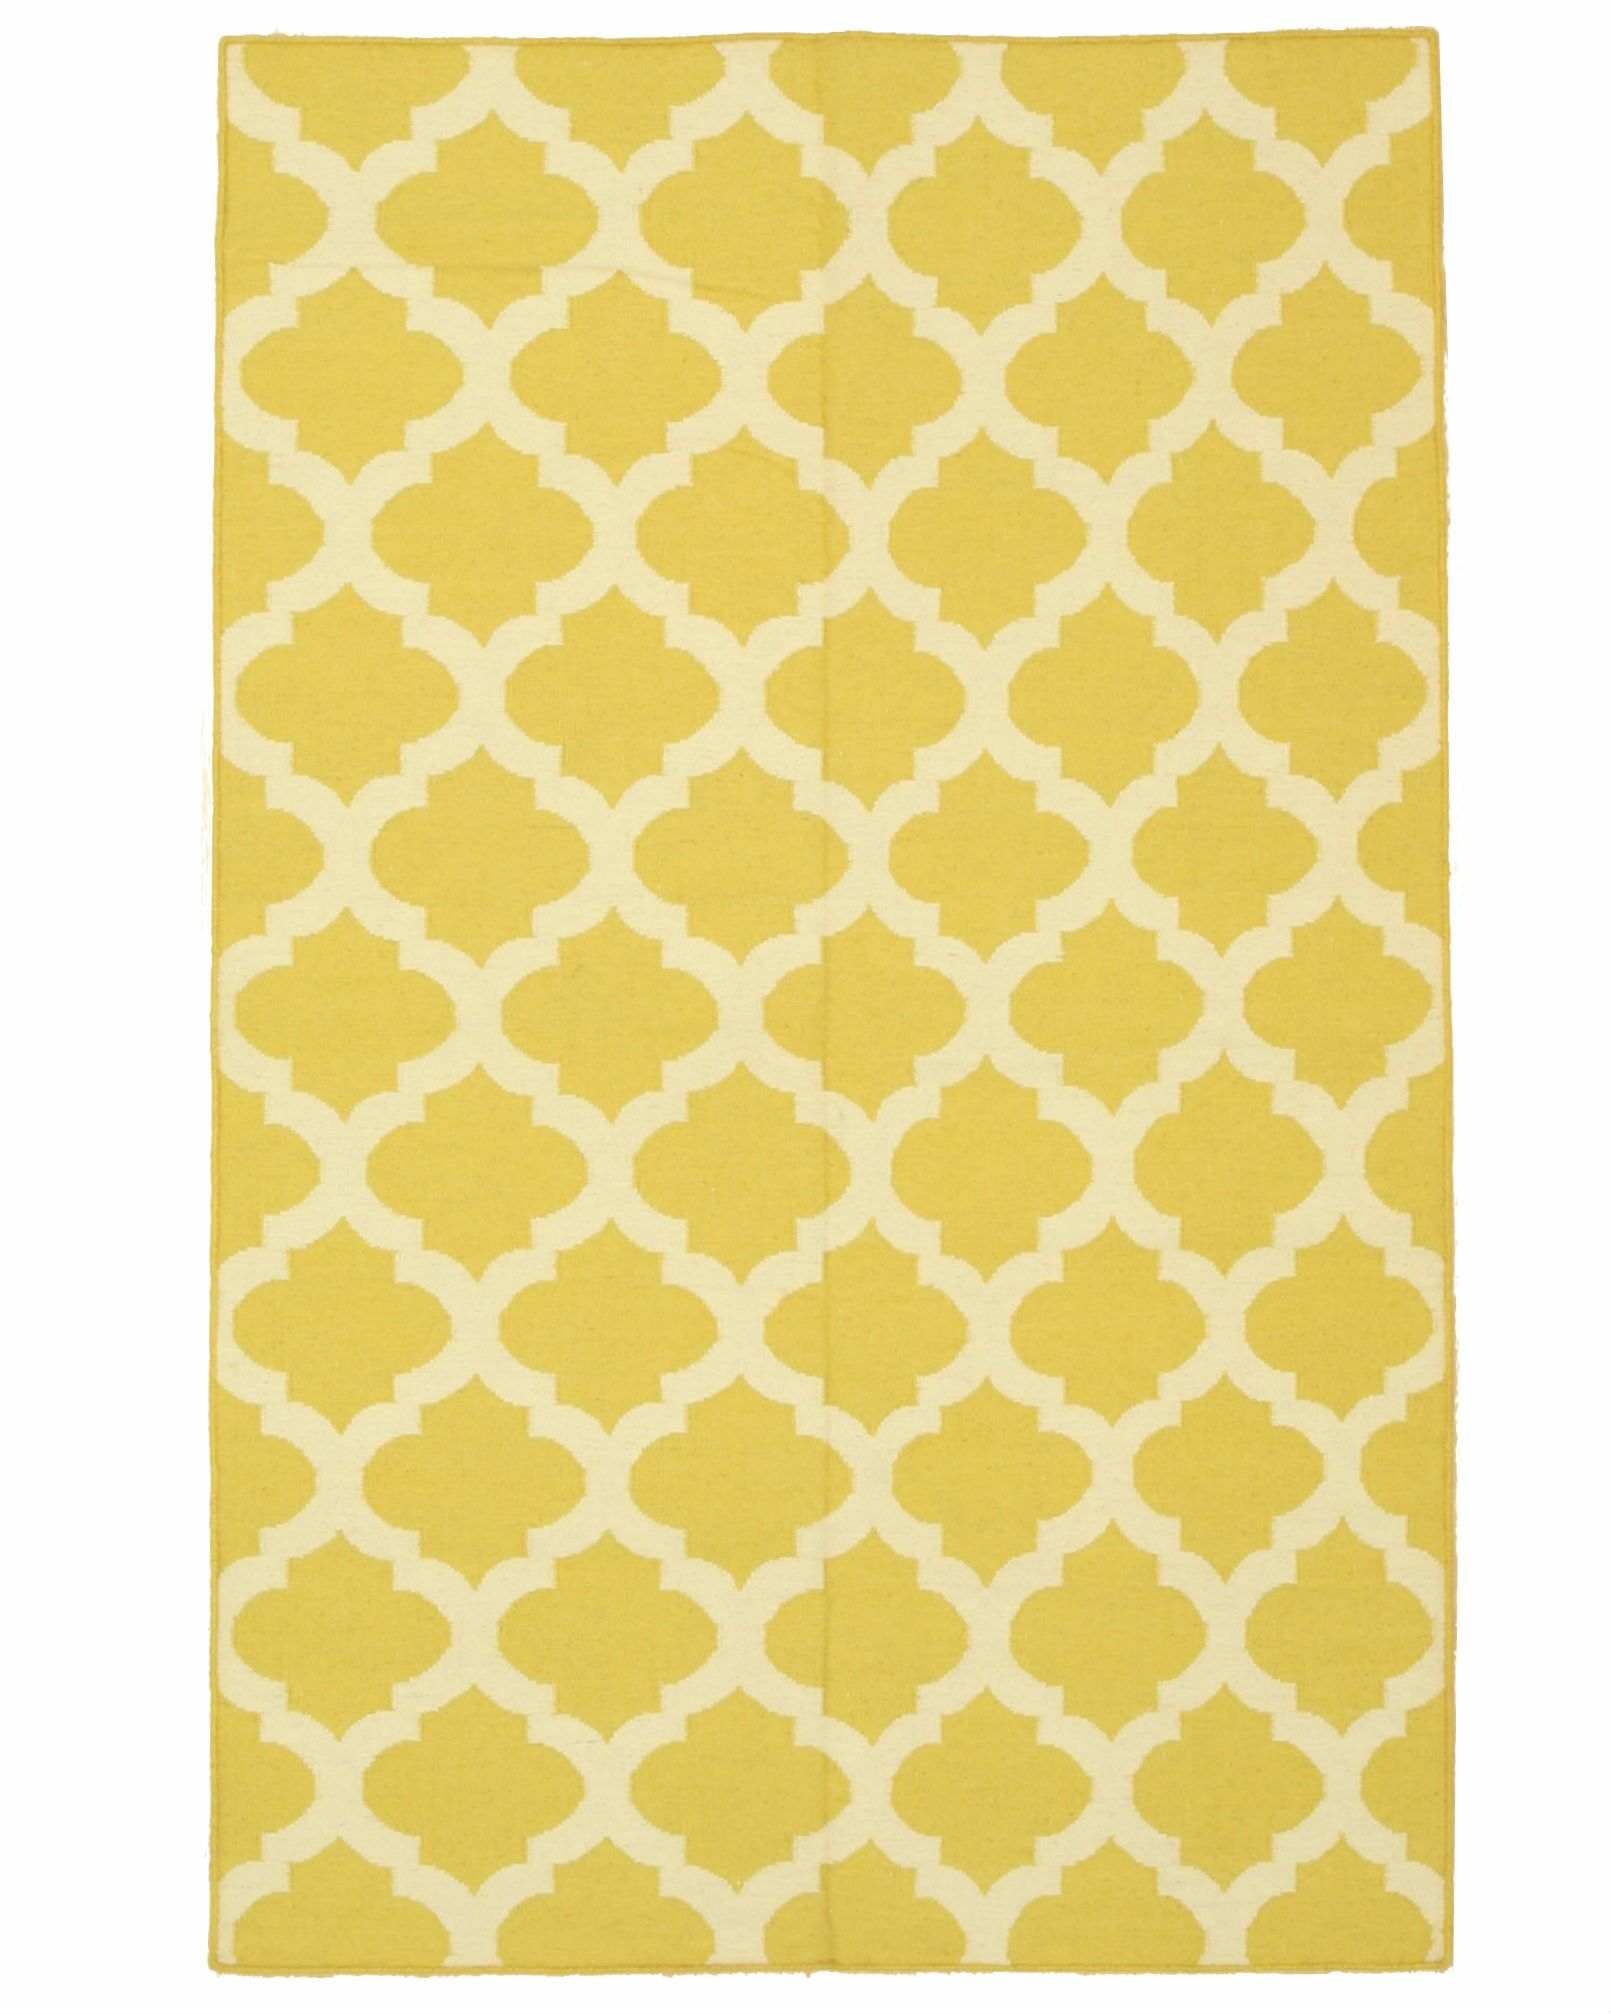 Durrant Handmade Yellow Area Rug Rug Size: 5' x 8'